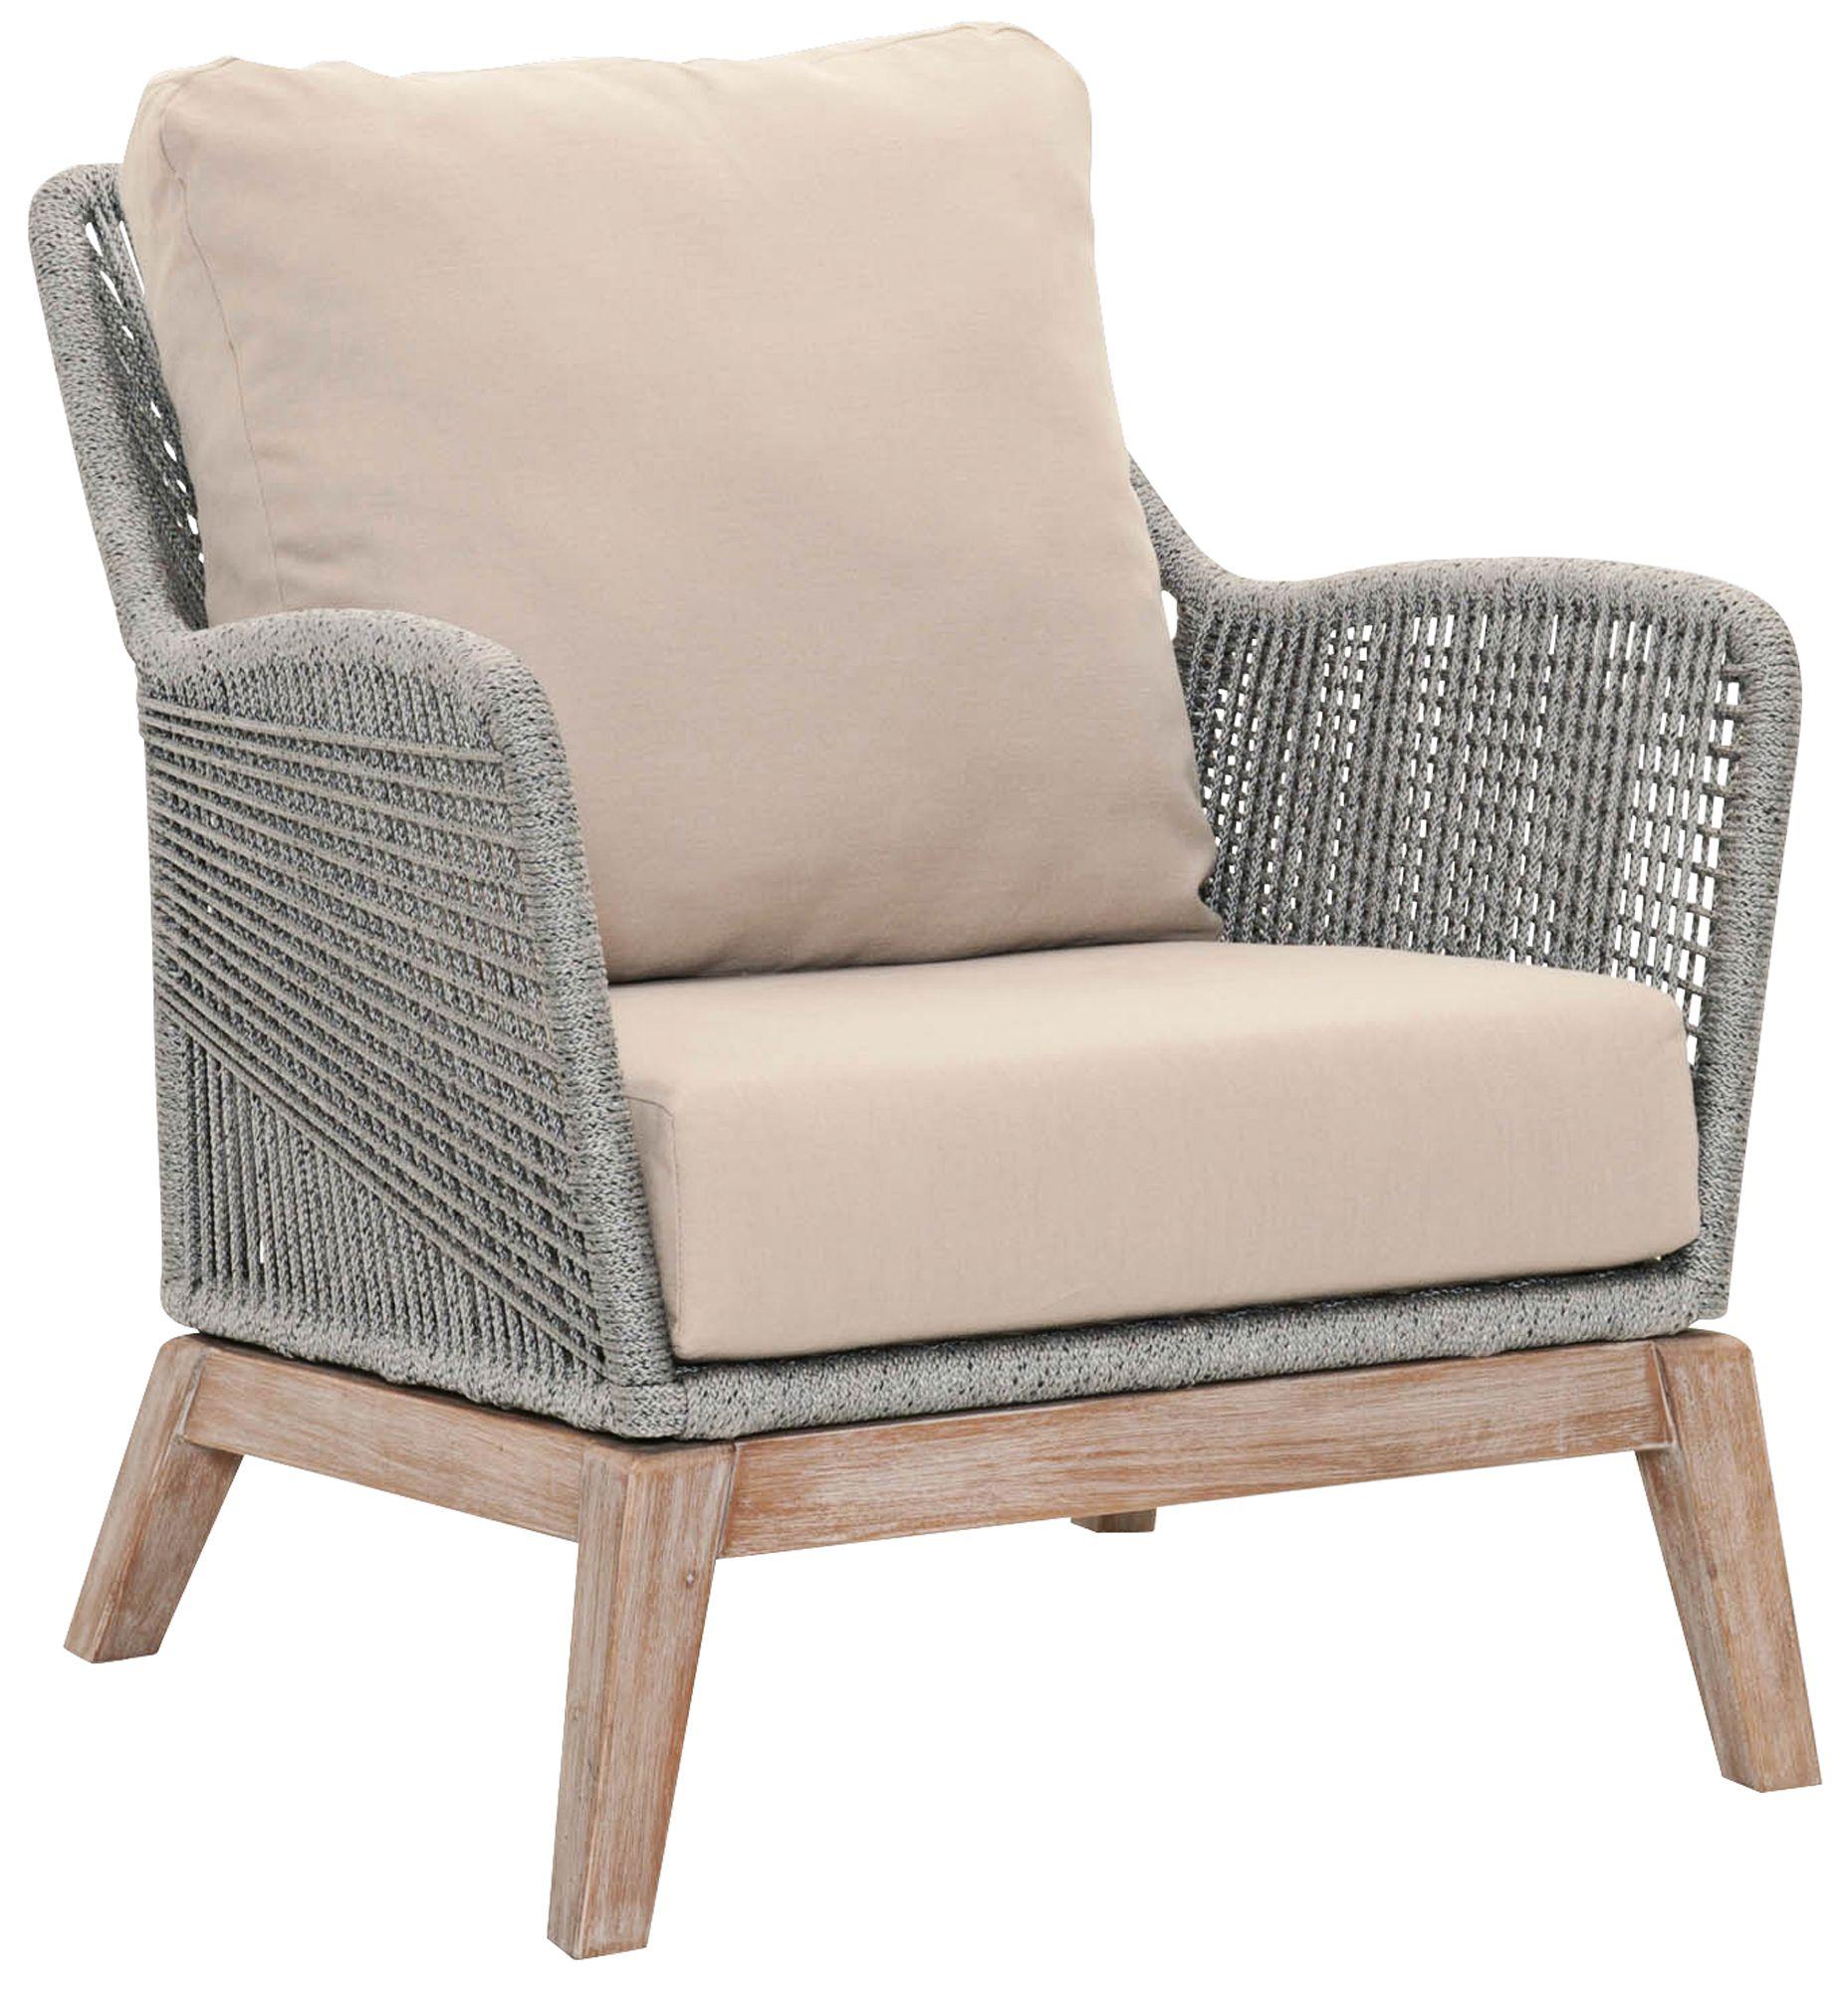 New Wicker Loom Mahogany And Platinum Rope Club Chair